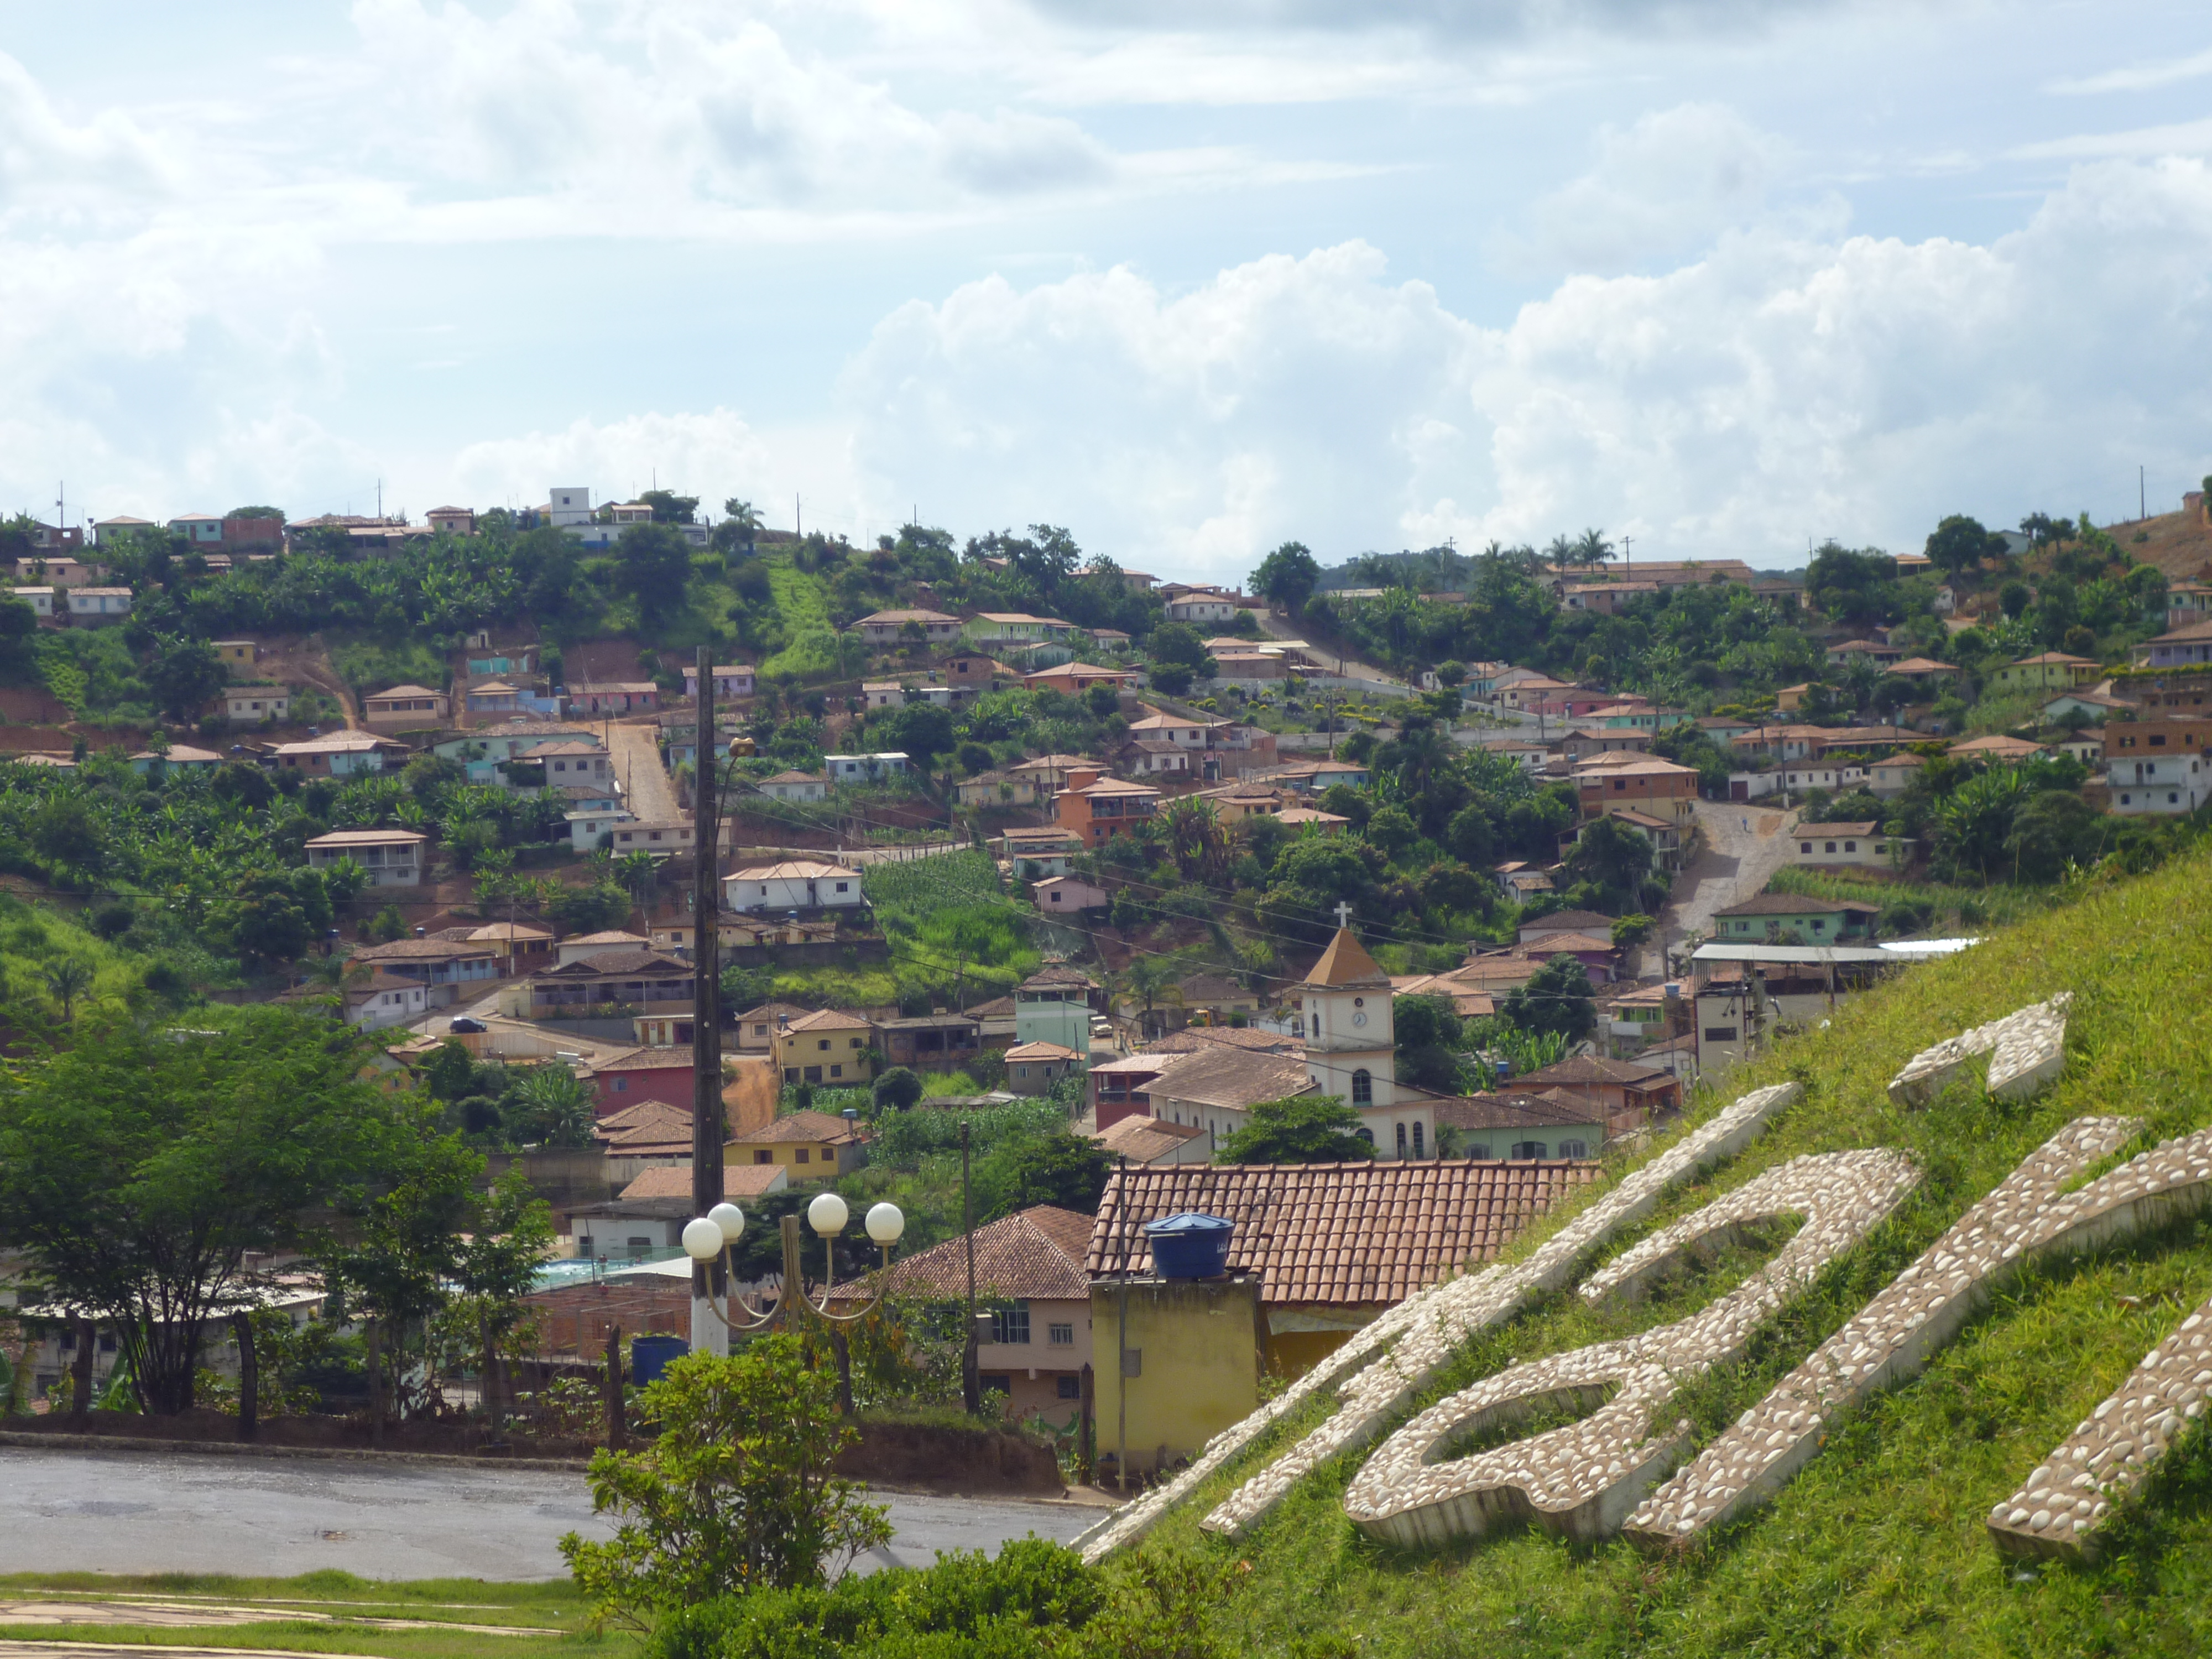 Materlândia Minas Gerais fonte: upload.wikimedia.org